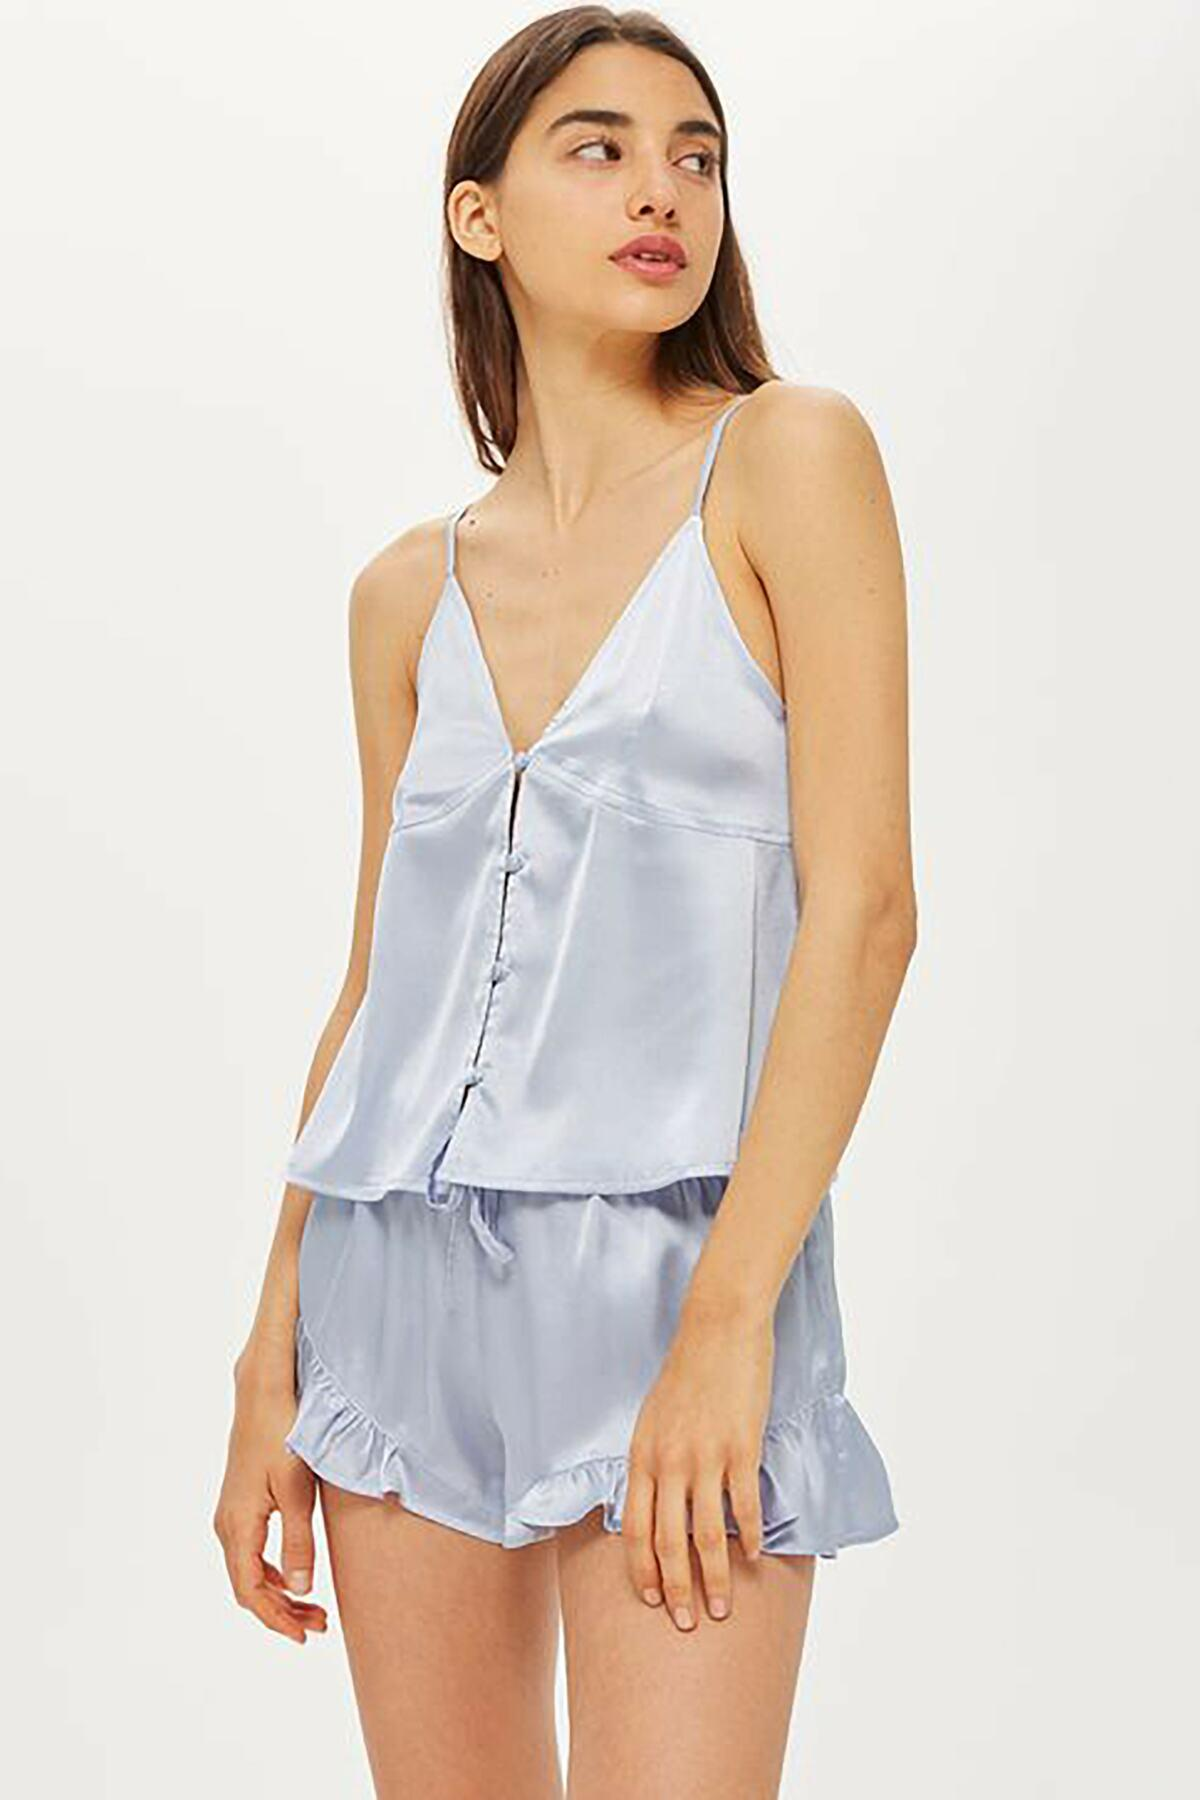 TOPSHOP - Blue Lucina Satin Short Pajamas - Lyst. View fullscreen ed40e7142